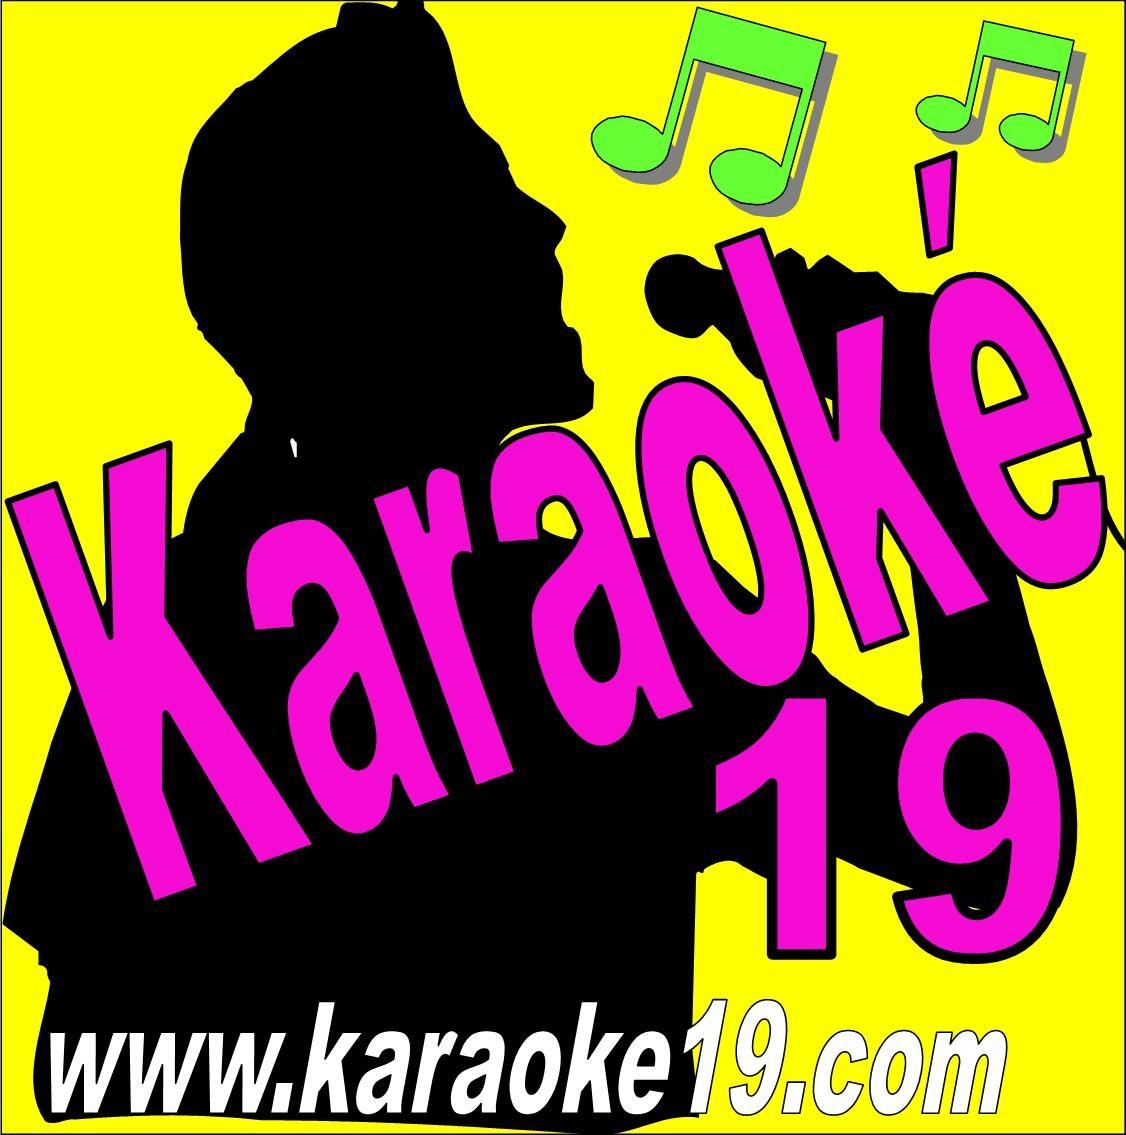 karaoke19.com